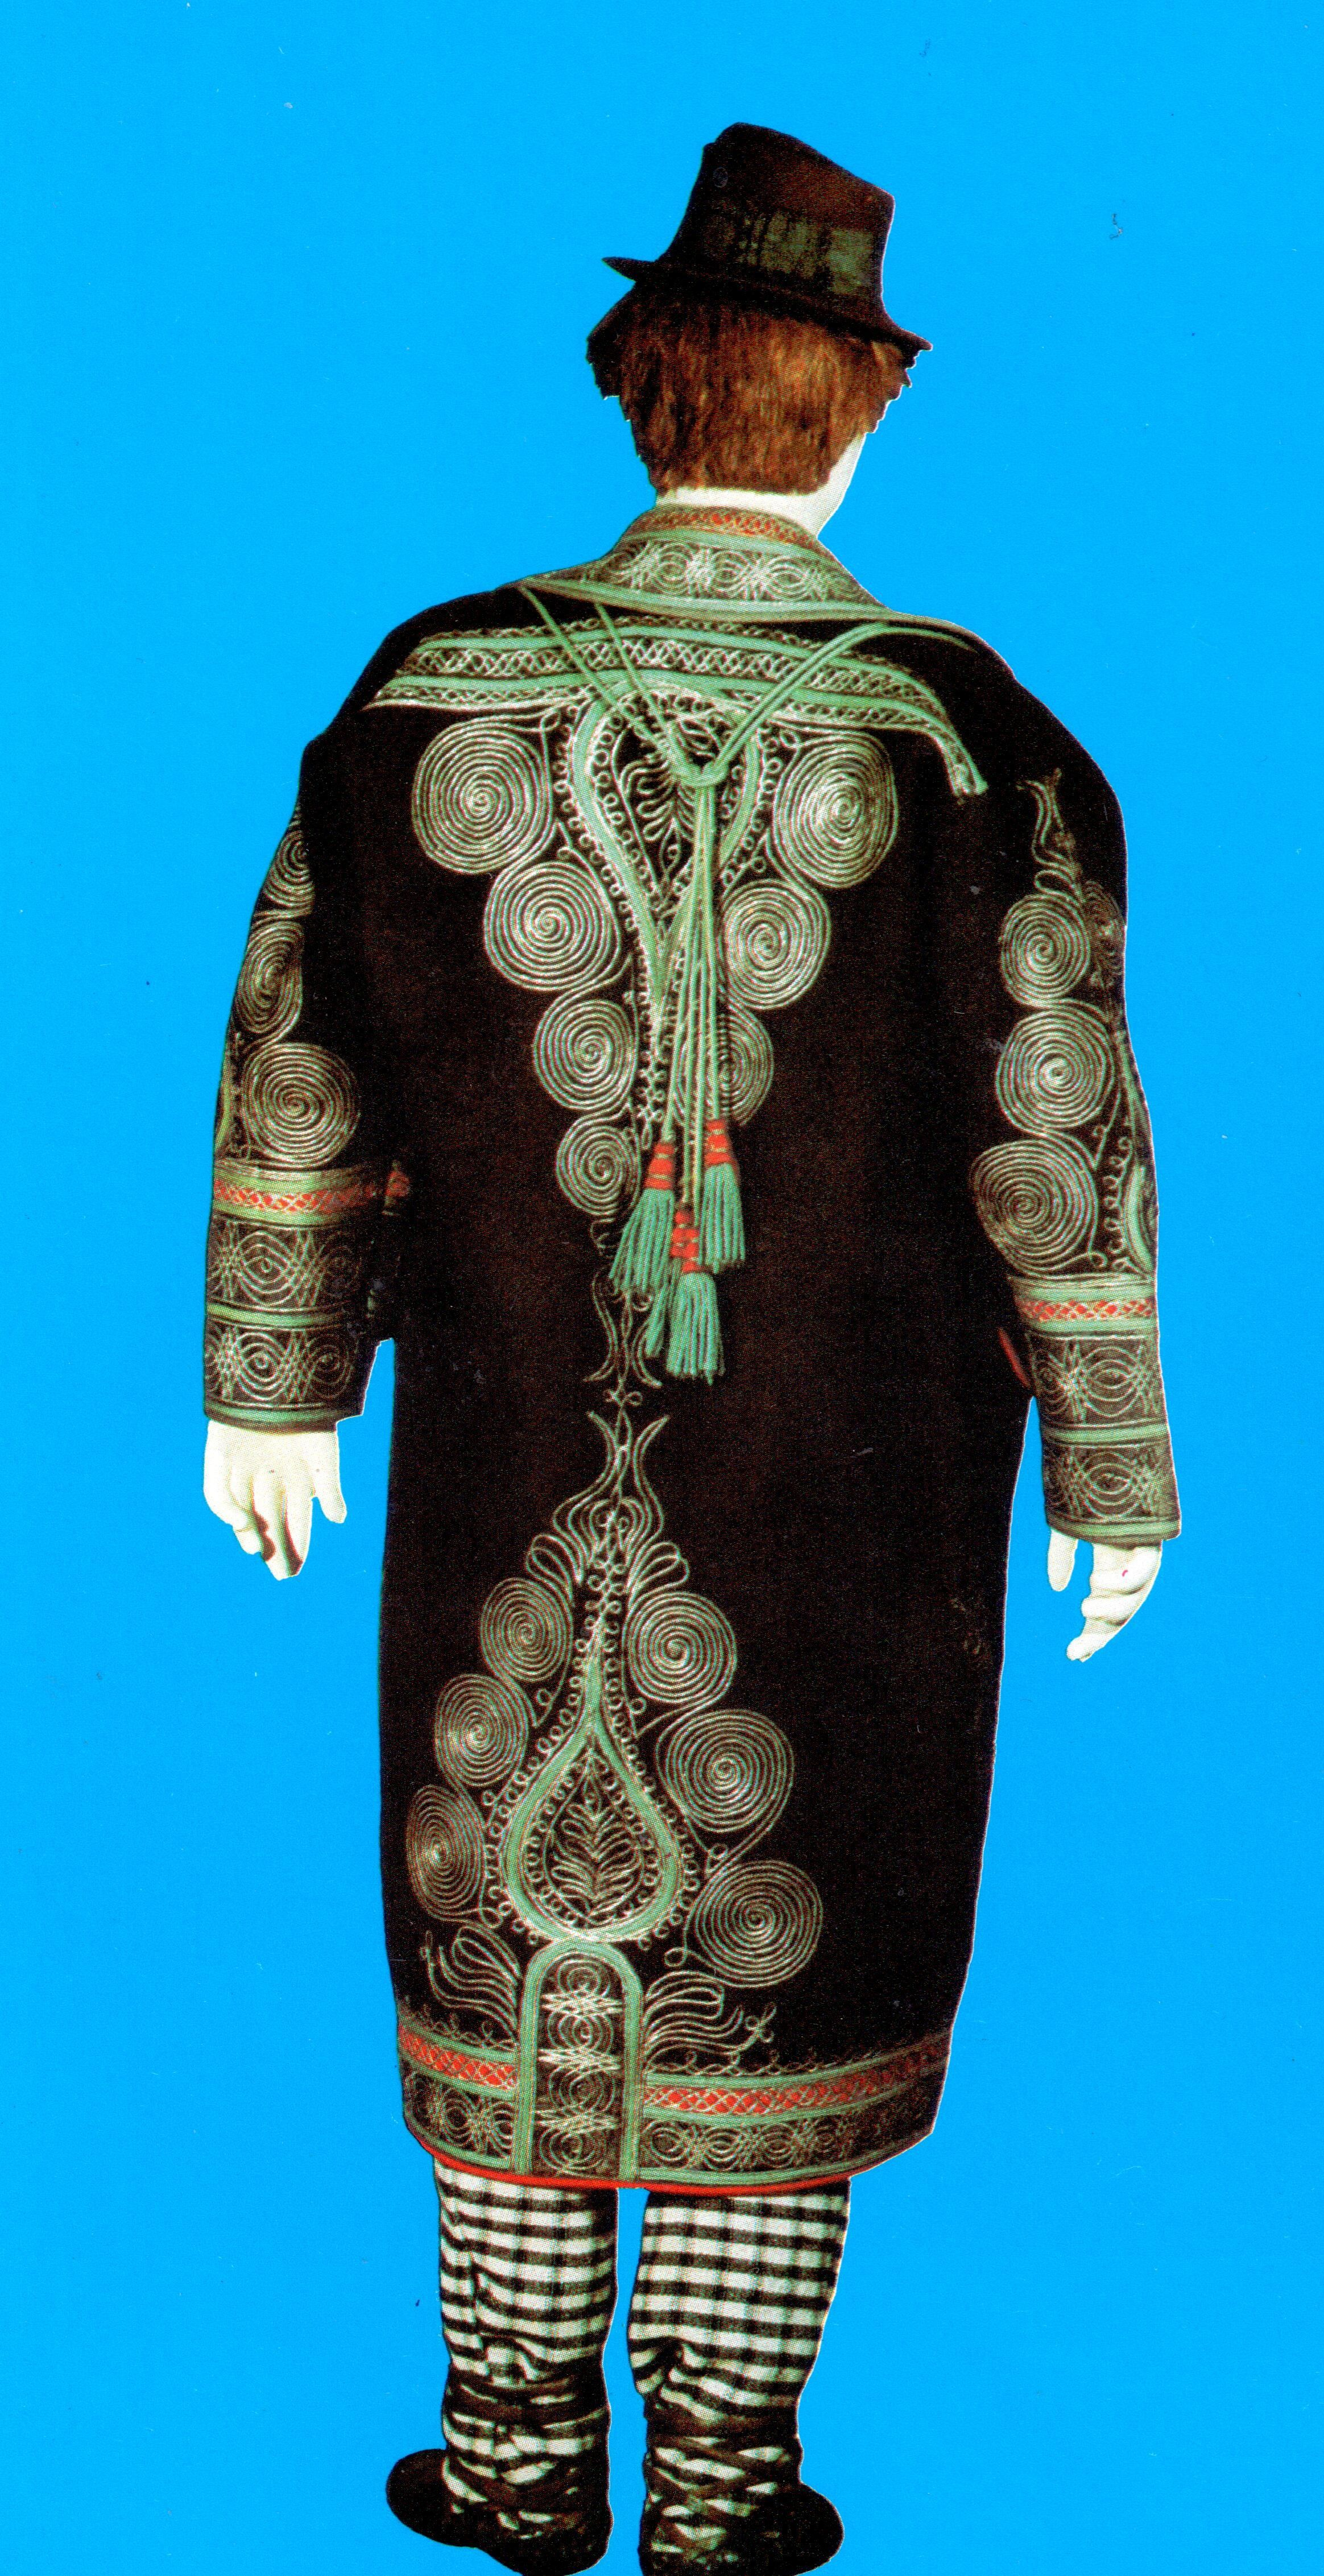 Croatia Zupanja Gradiste Man In Decorative Coat The Etnographic Museum Of The City Of Zagreb City Of Zagreb Gradiste National Dress